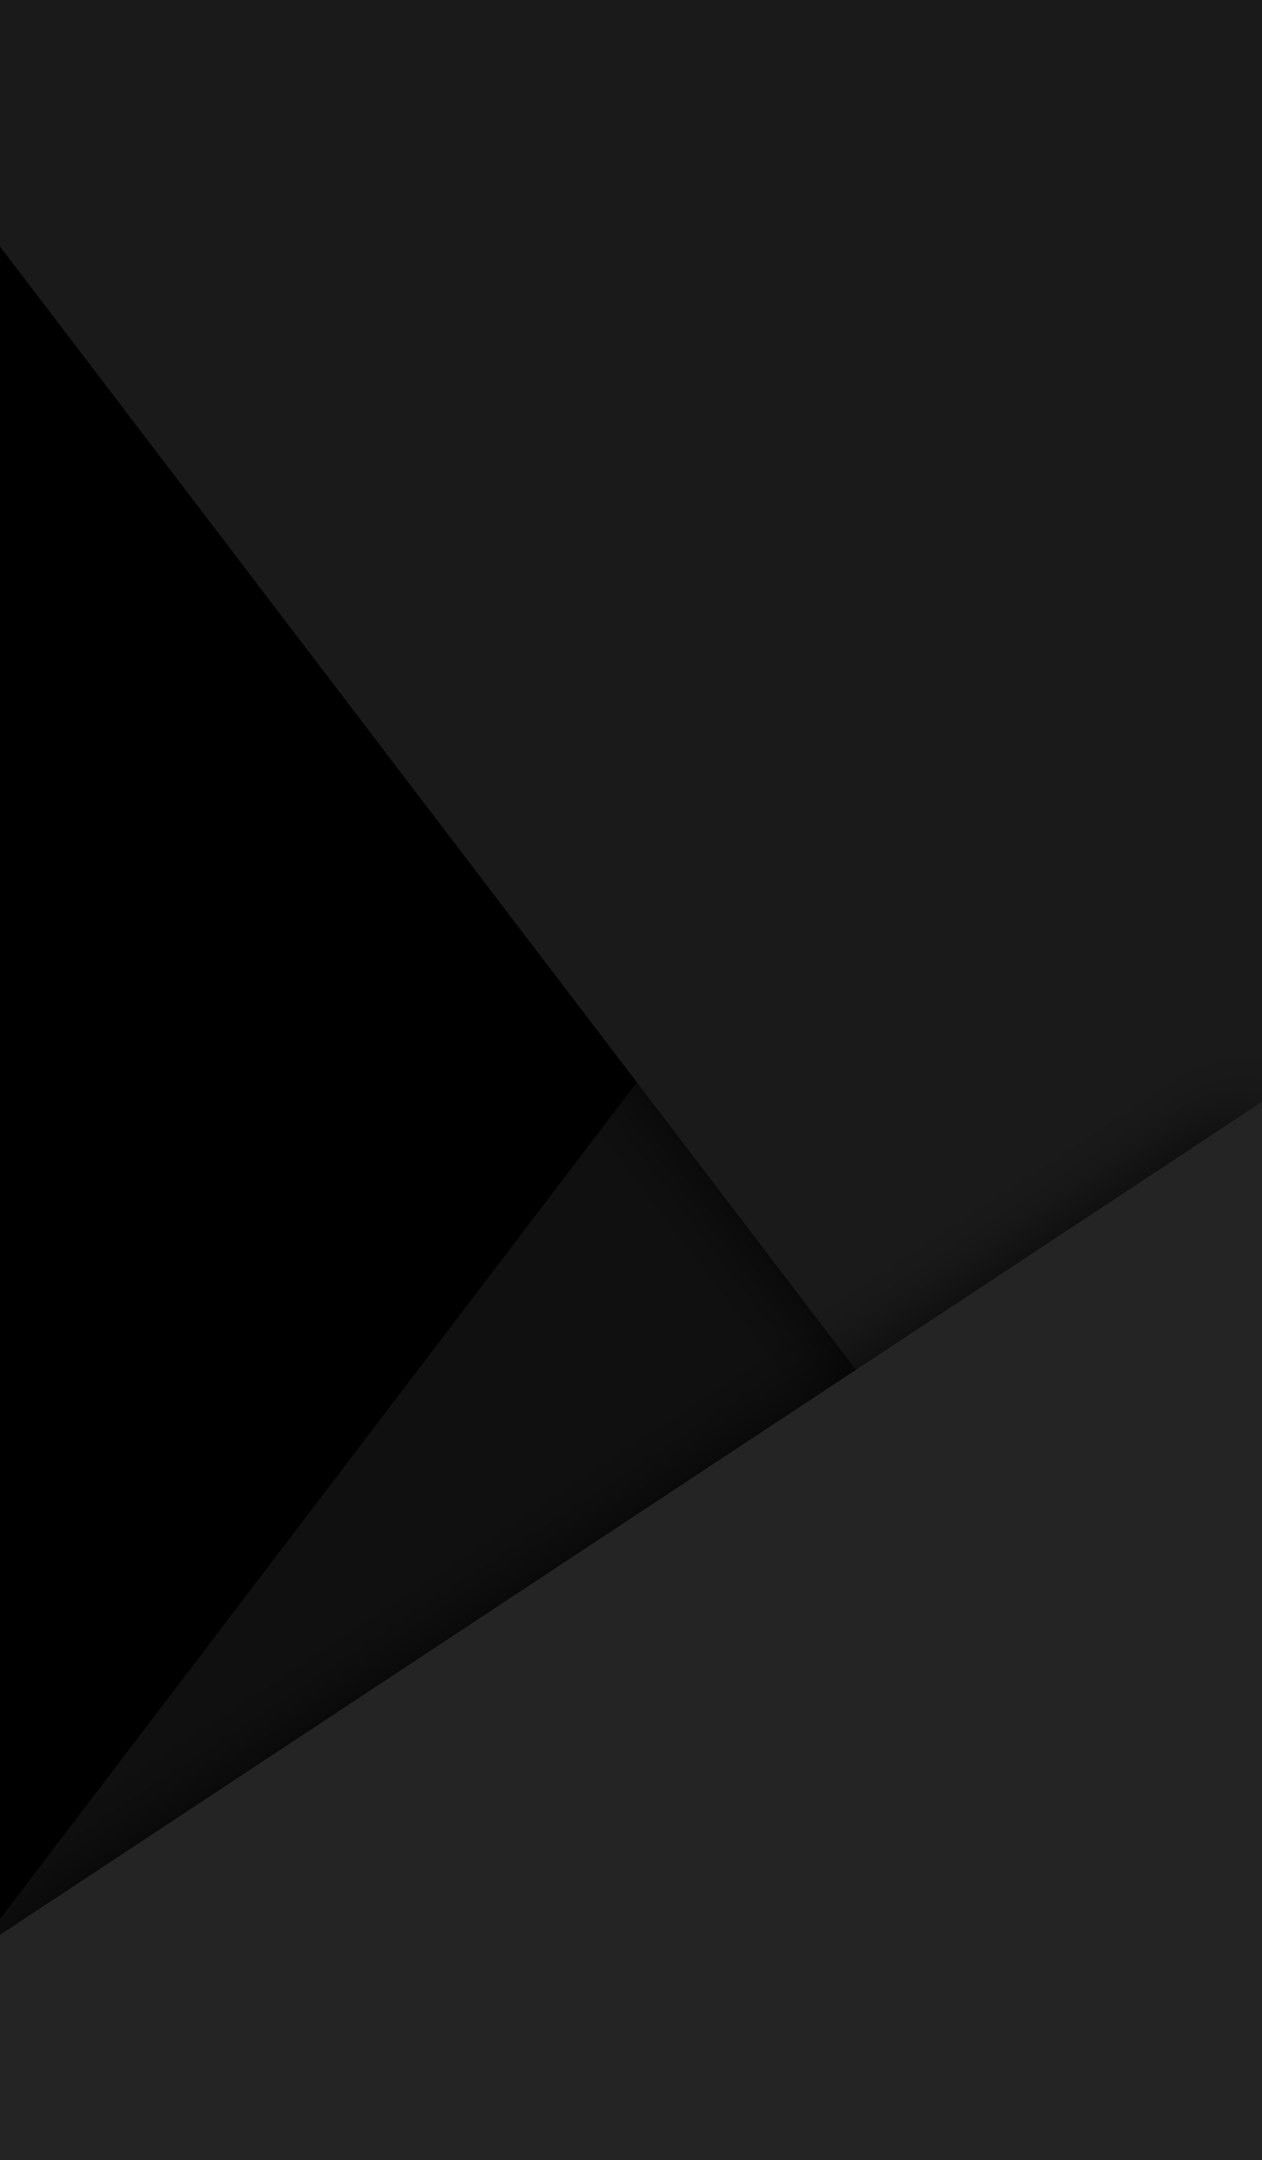 Pure Black Wallpaper 1262x2160 For Phone Pure Black Wallpaper Black Wallpaper Black Phone Wallpaper